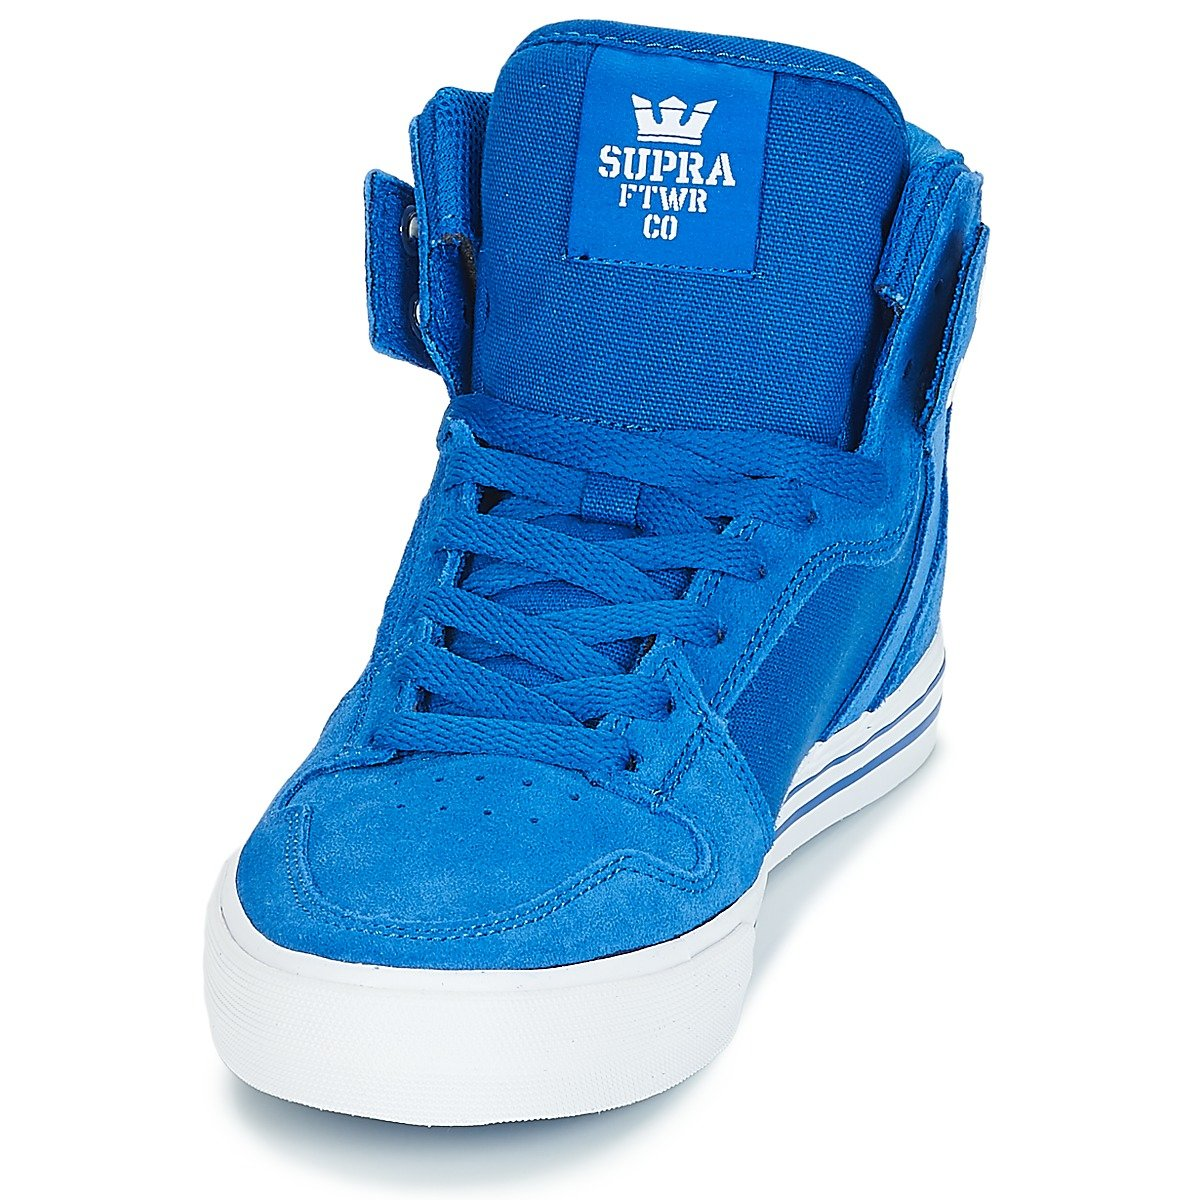 Supra Vaider LC Sneaker B074KHZS7H US|Ocean/White 16 M US|Ocean/White B074KHZS7H 3ff972